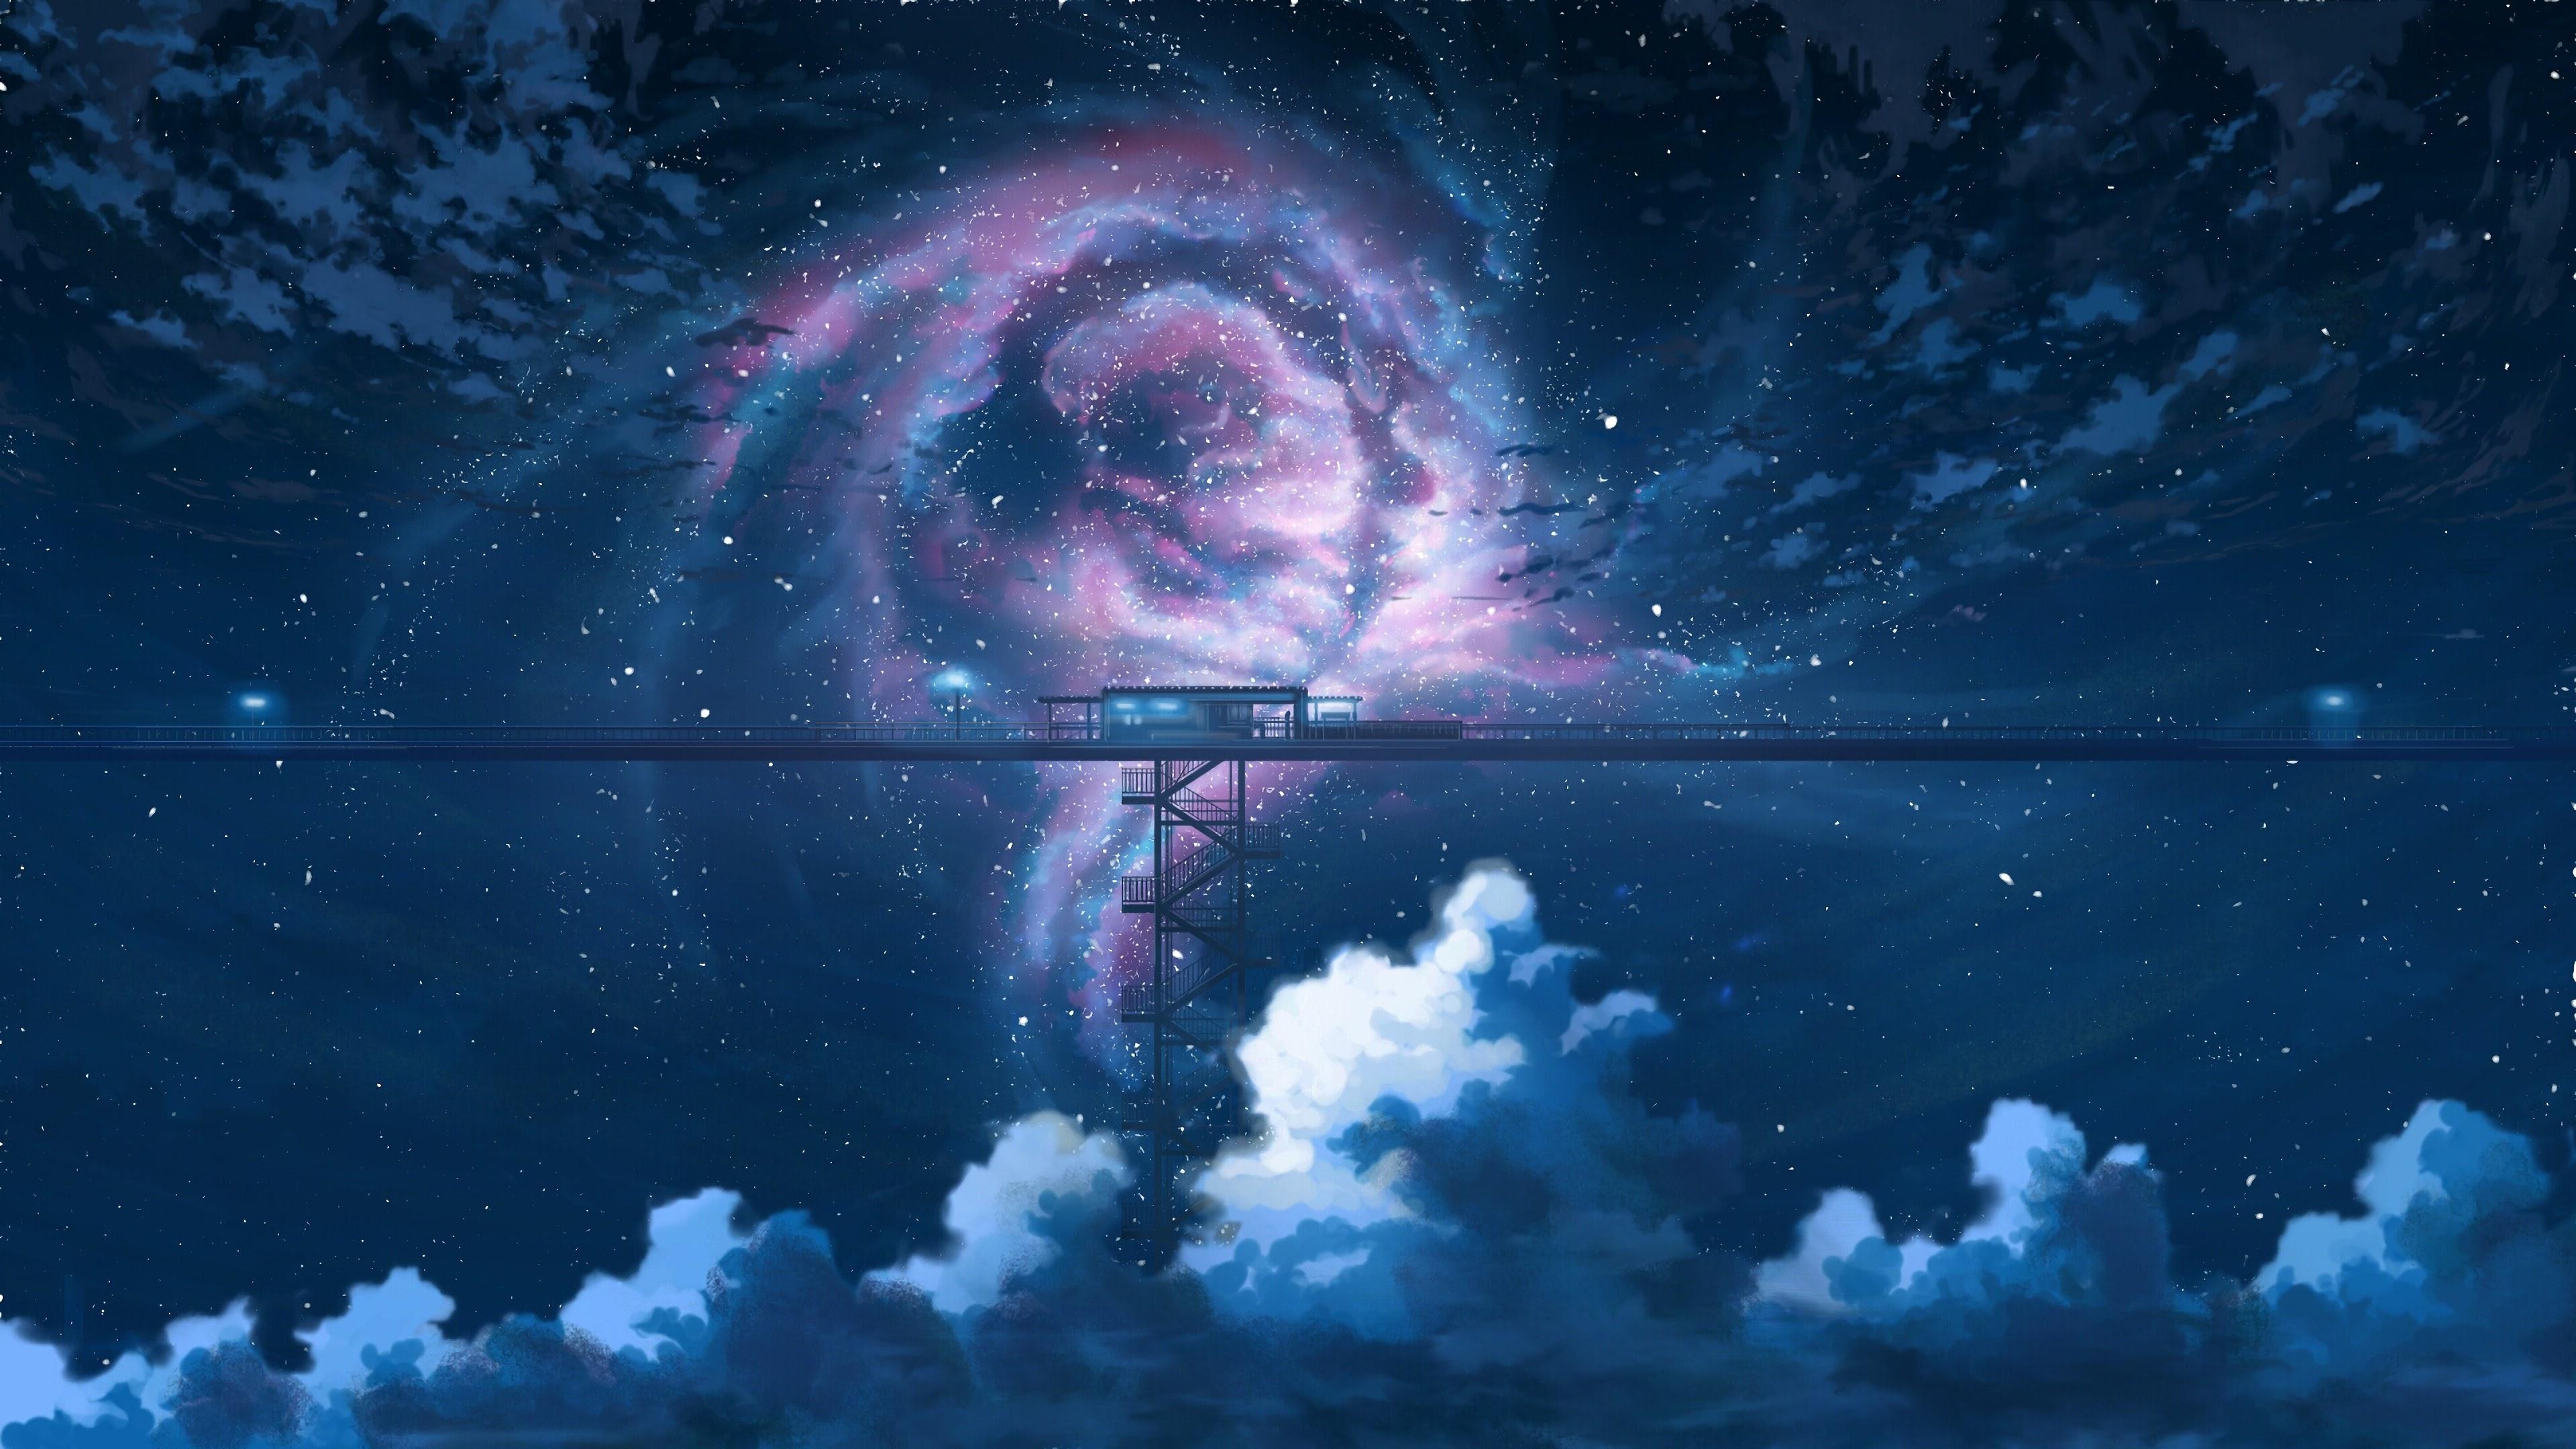 Anime, Night, Sky, Stars, Clouds, Scenery, 4K, #94 Wallpaper